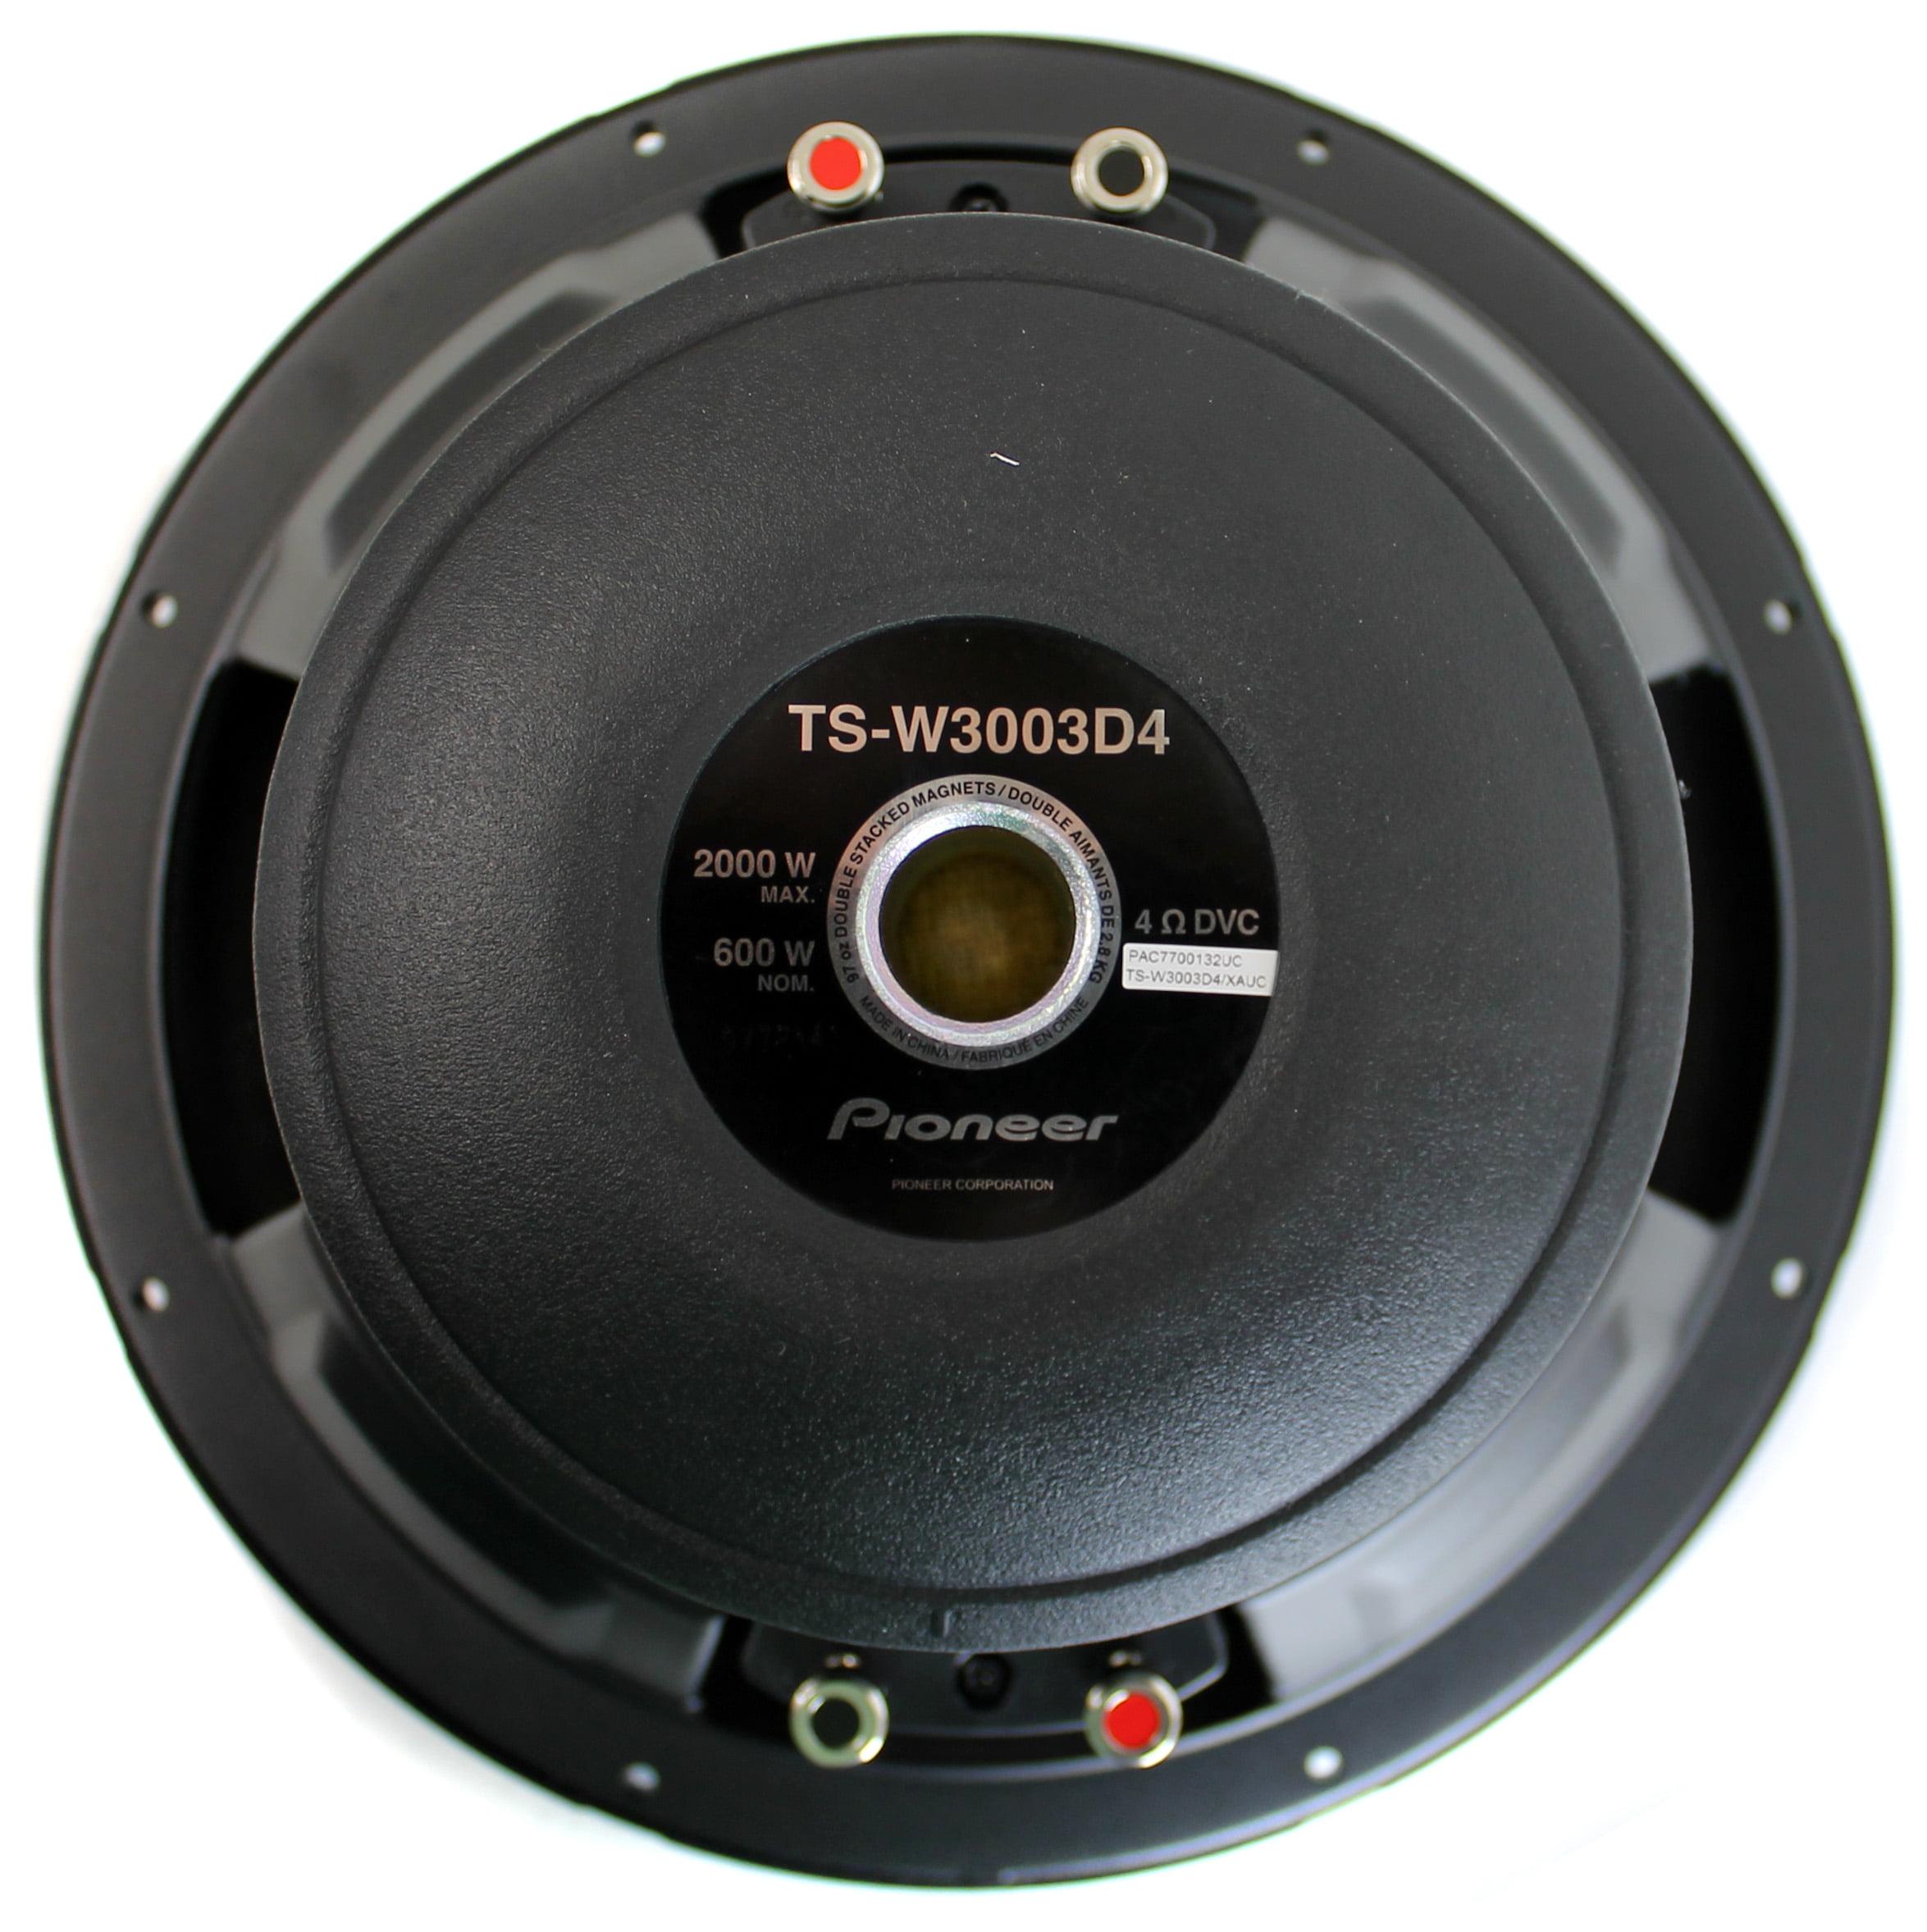 Pioneer Ts W3003d4 12 2000 Watt Champion Pro Subwoofer 8ohm Sub Wiring Diagram